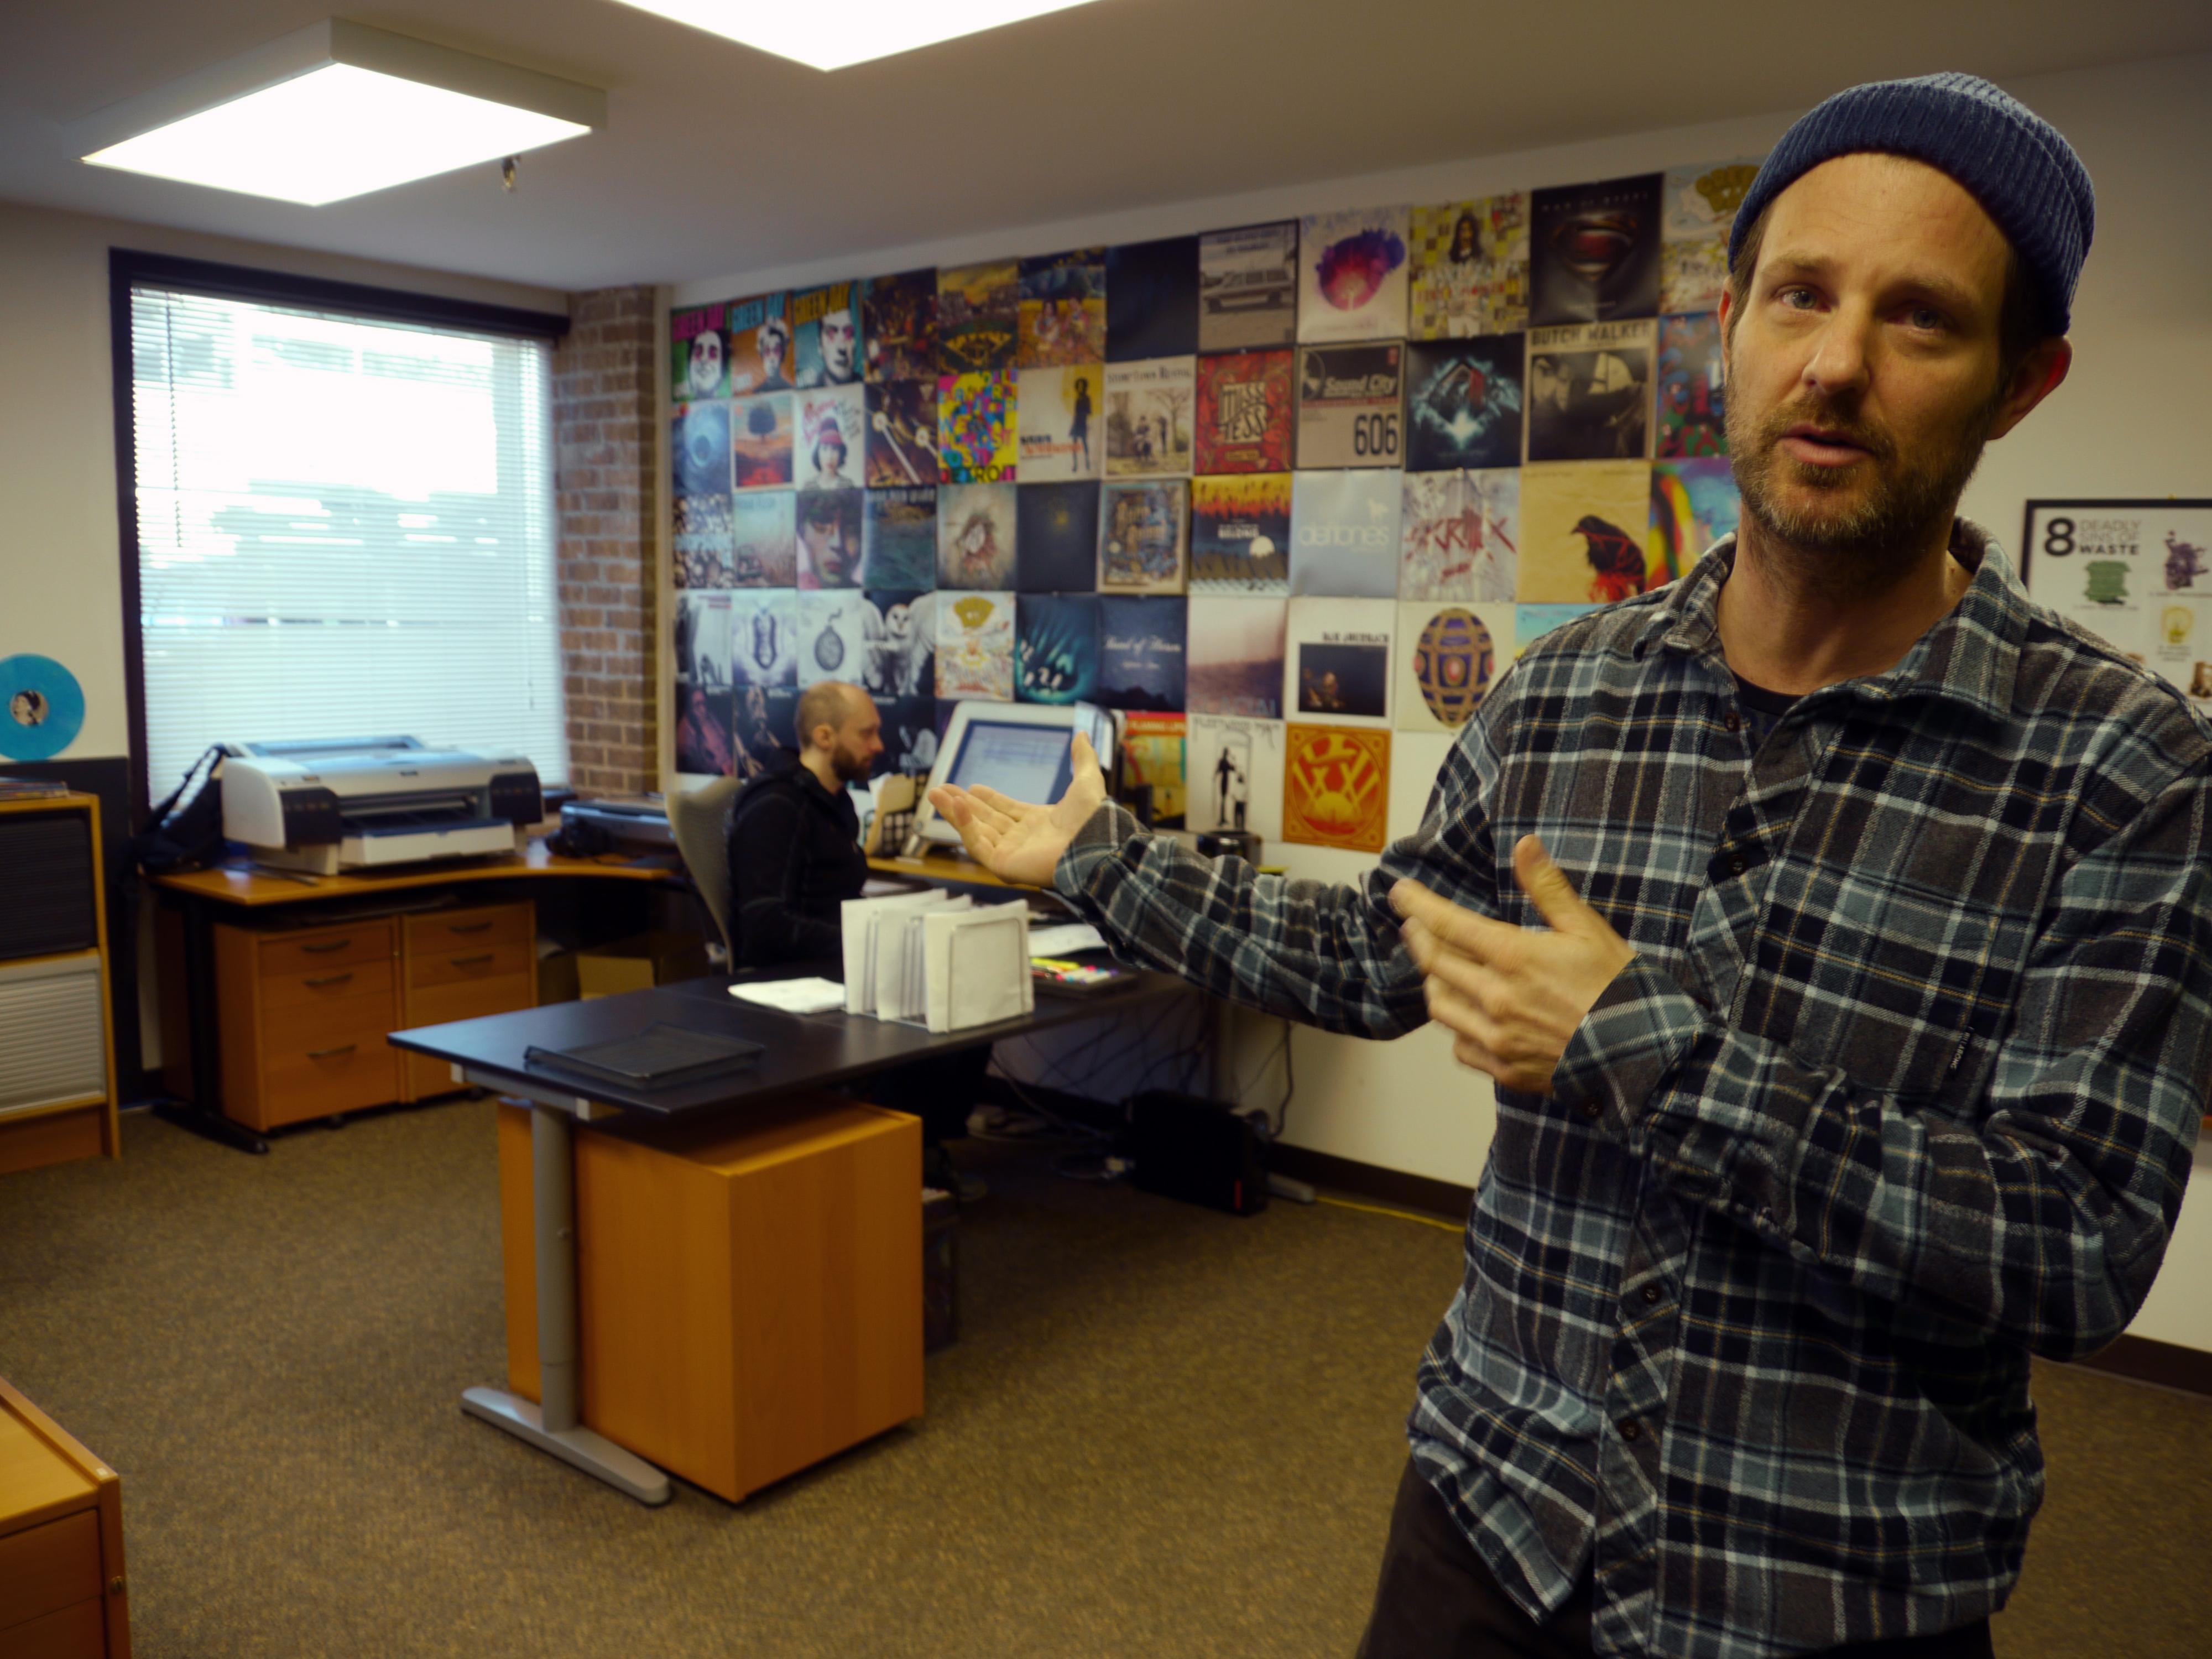 Behind the scenes: Pressing vinyl records in Fairfax (Photos)